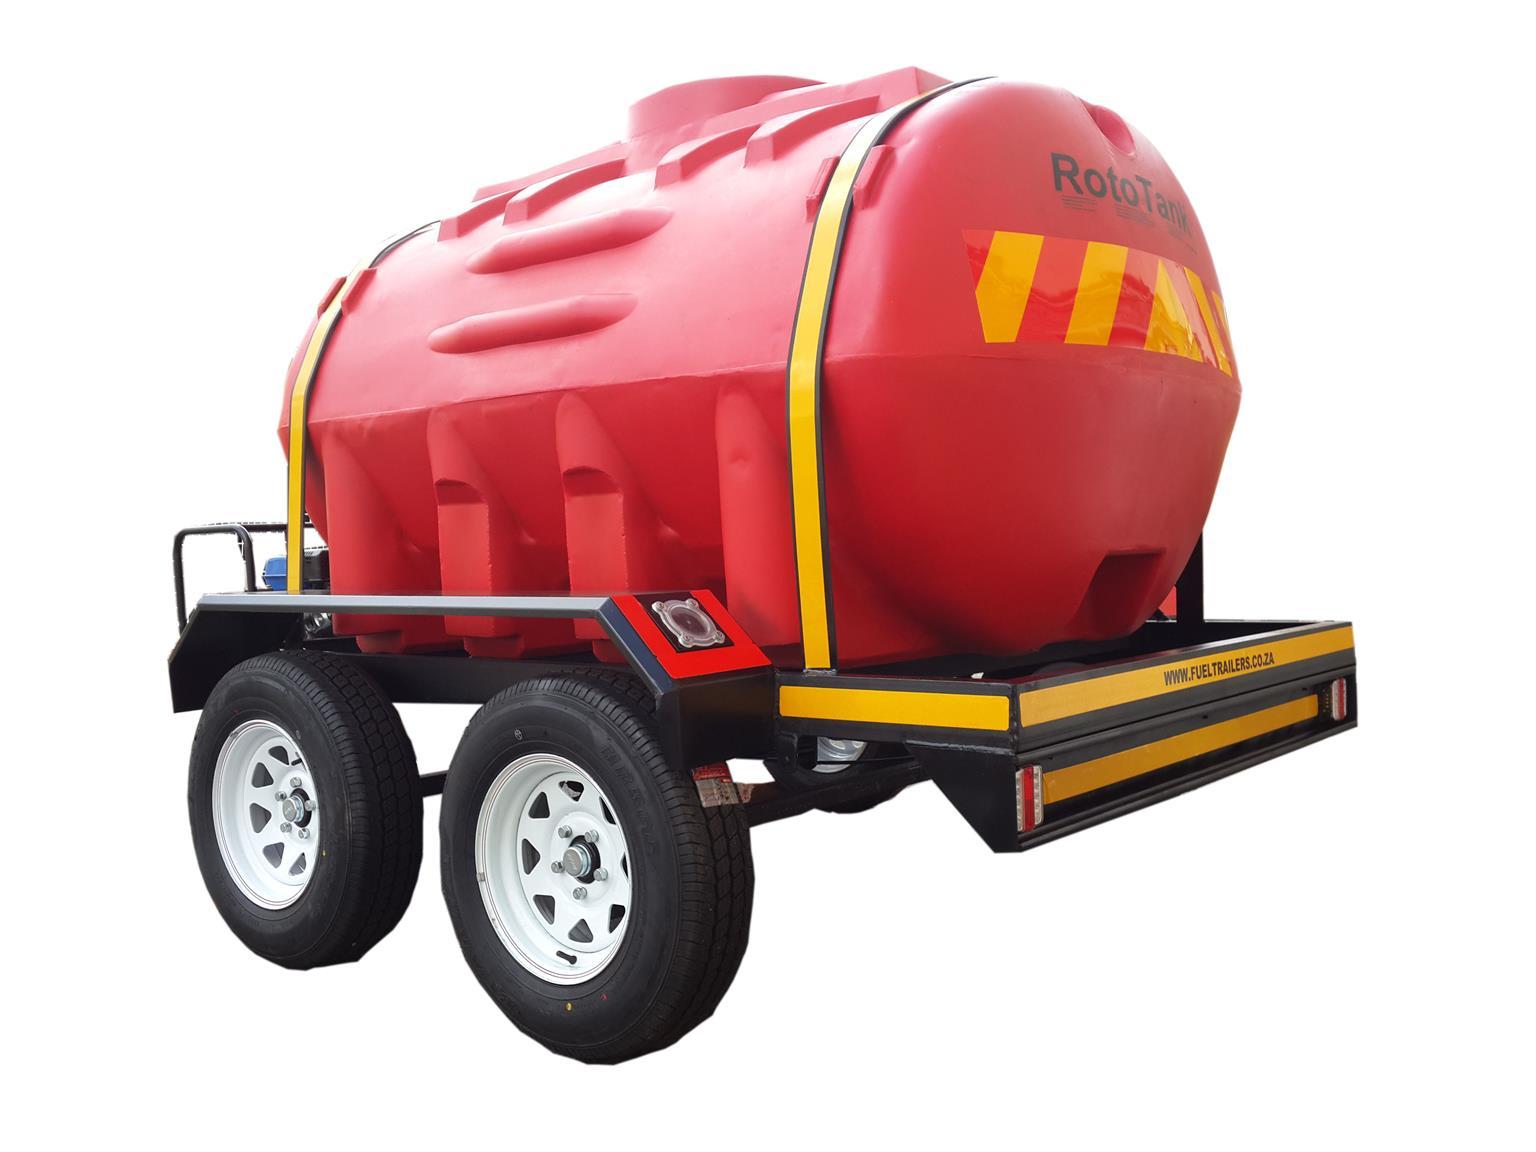 DIESEL BOWSER. Petro Bowser  AVGAS // JET A1 TRAILER //MOGAS//DIESEL//Paraffin Liquid Trailer